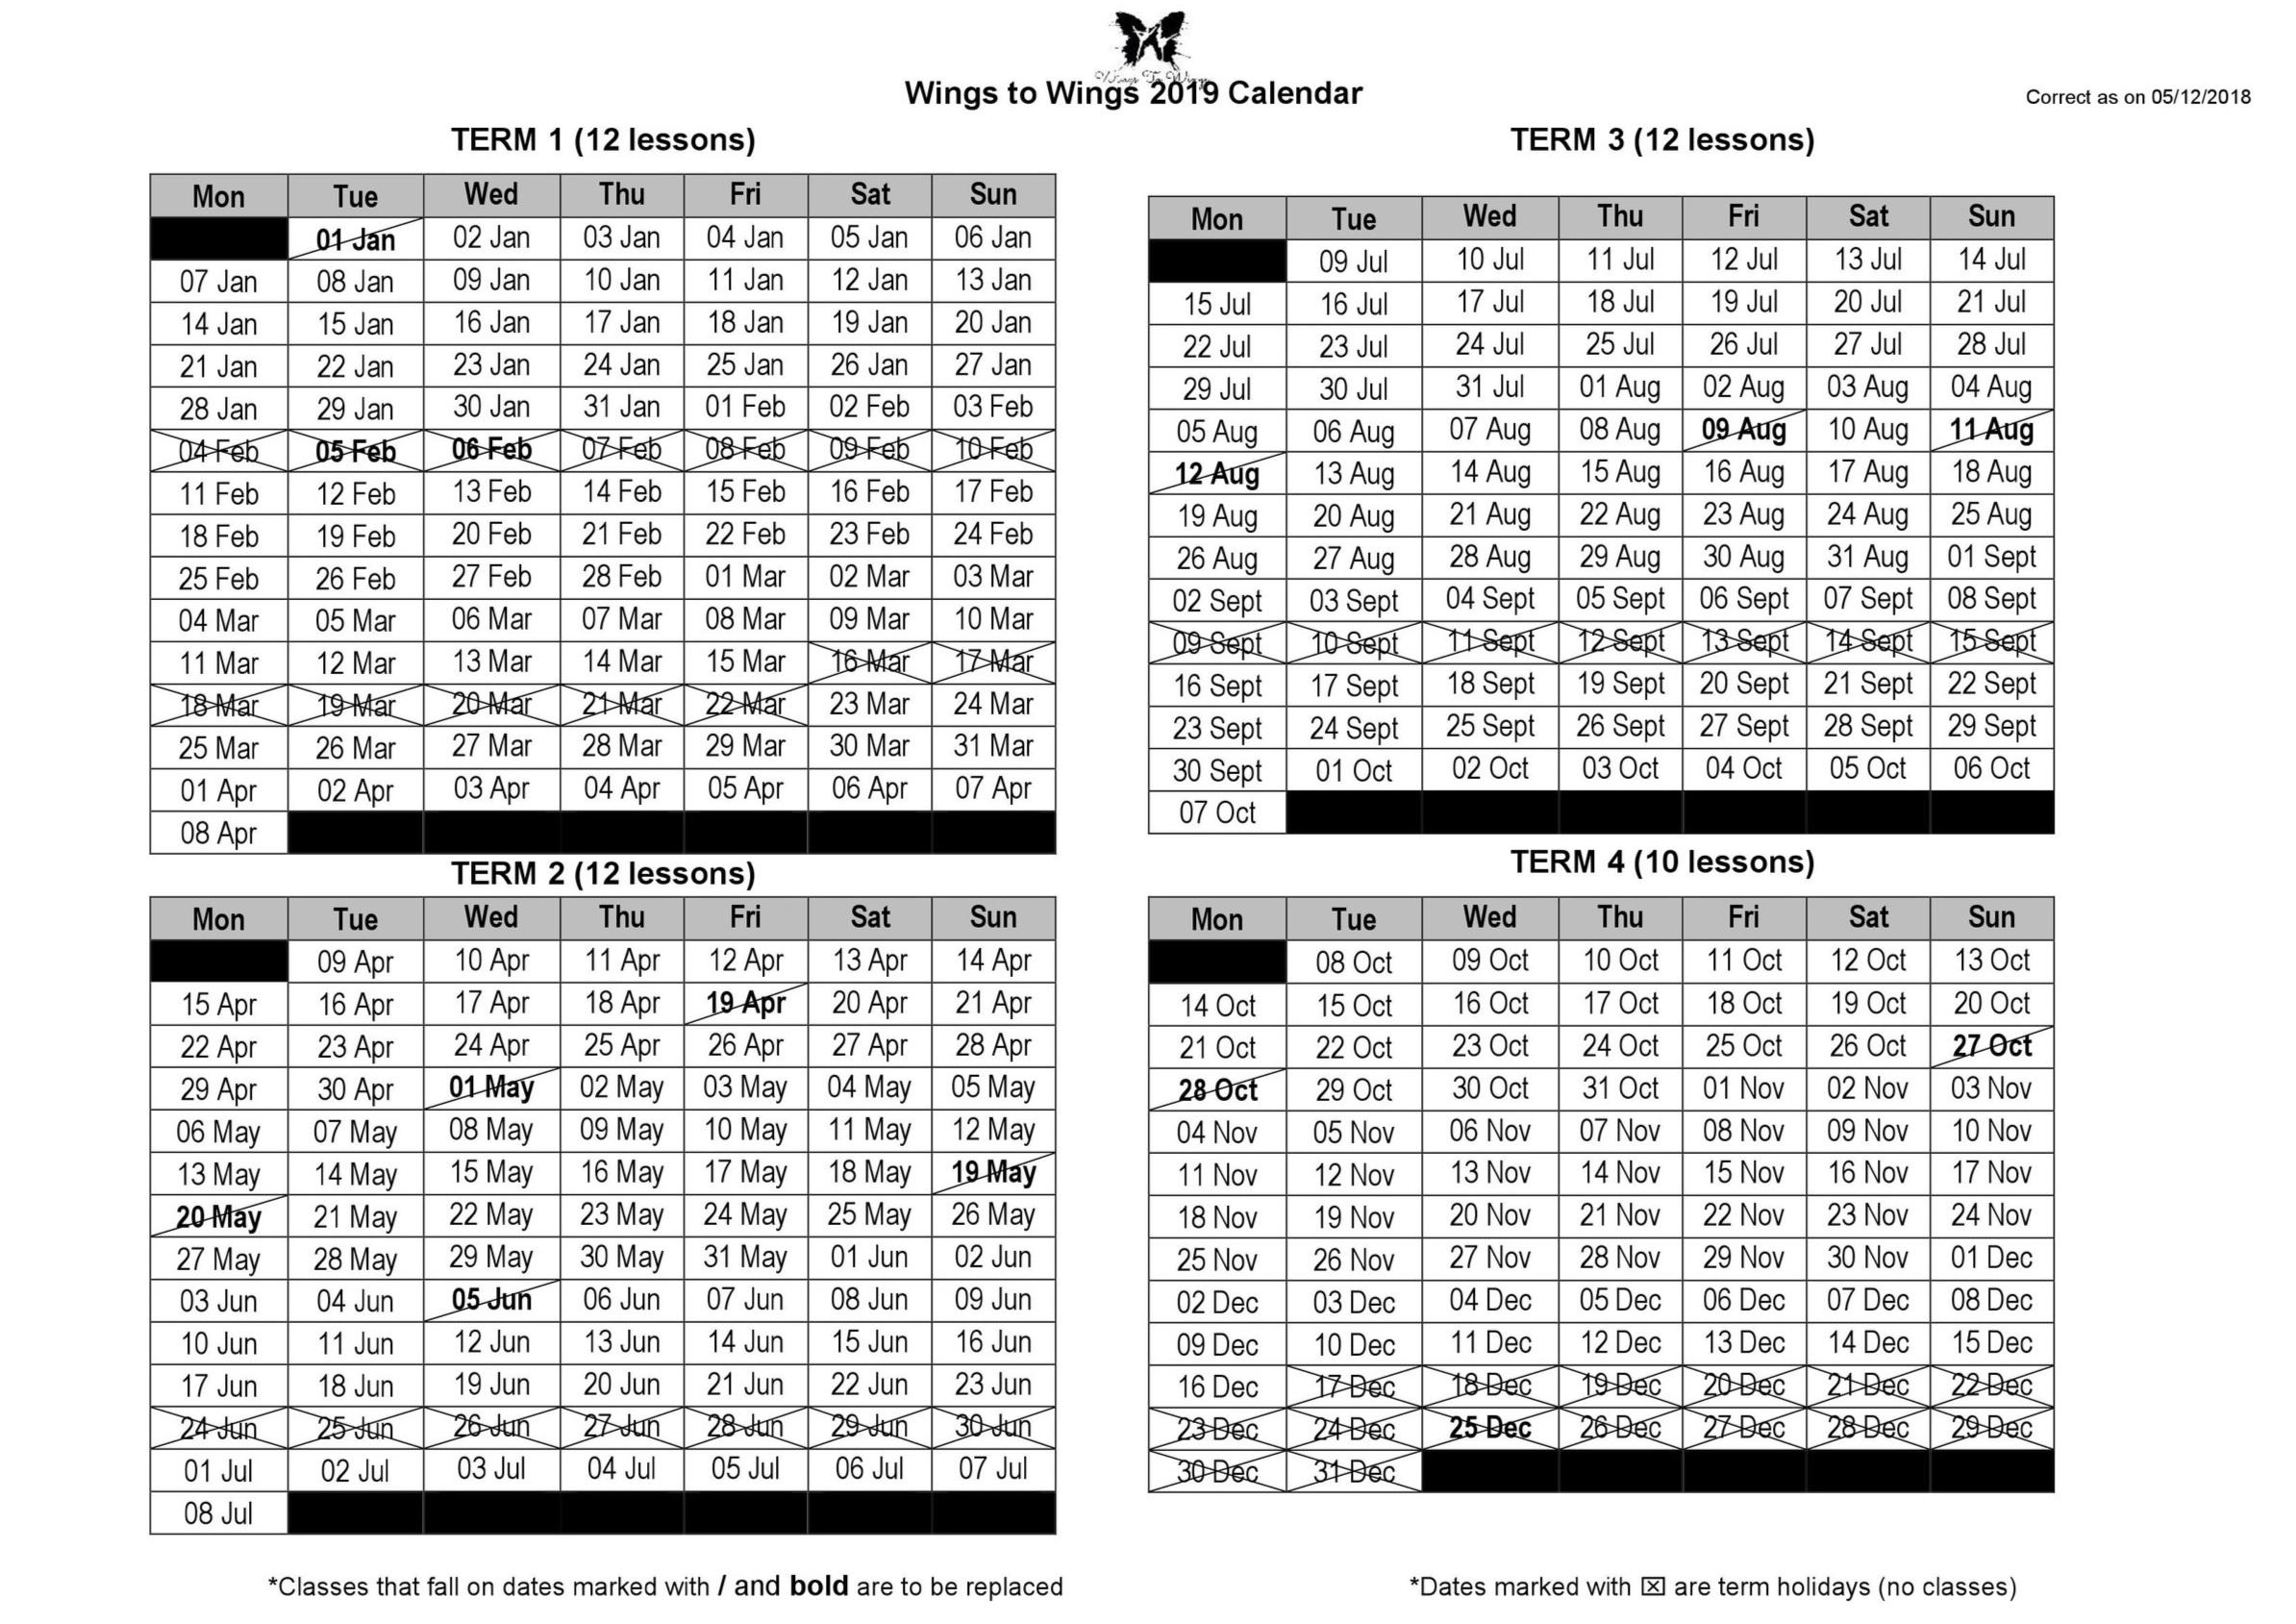 Term+4+Calendar+Dates